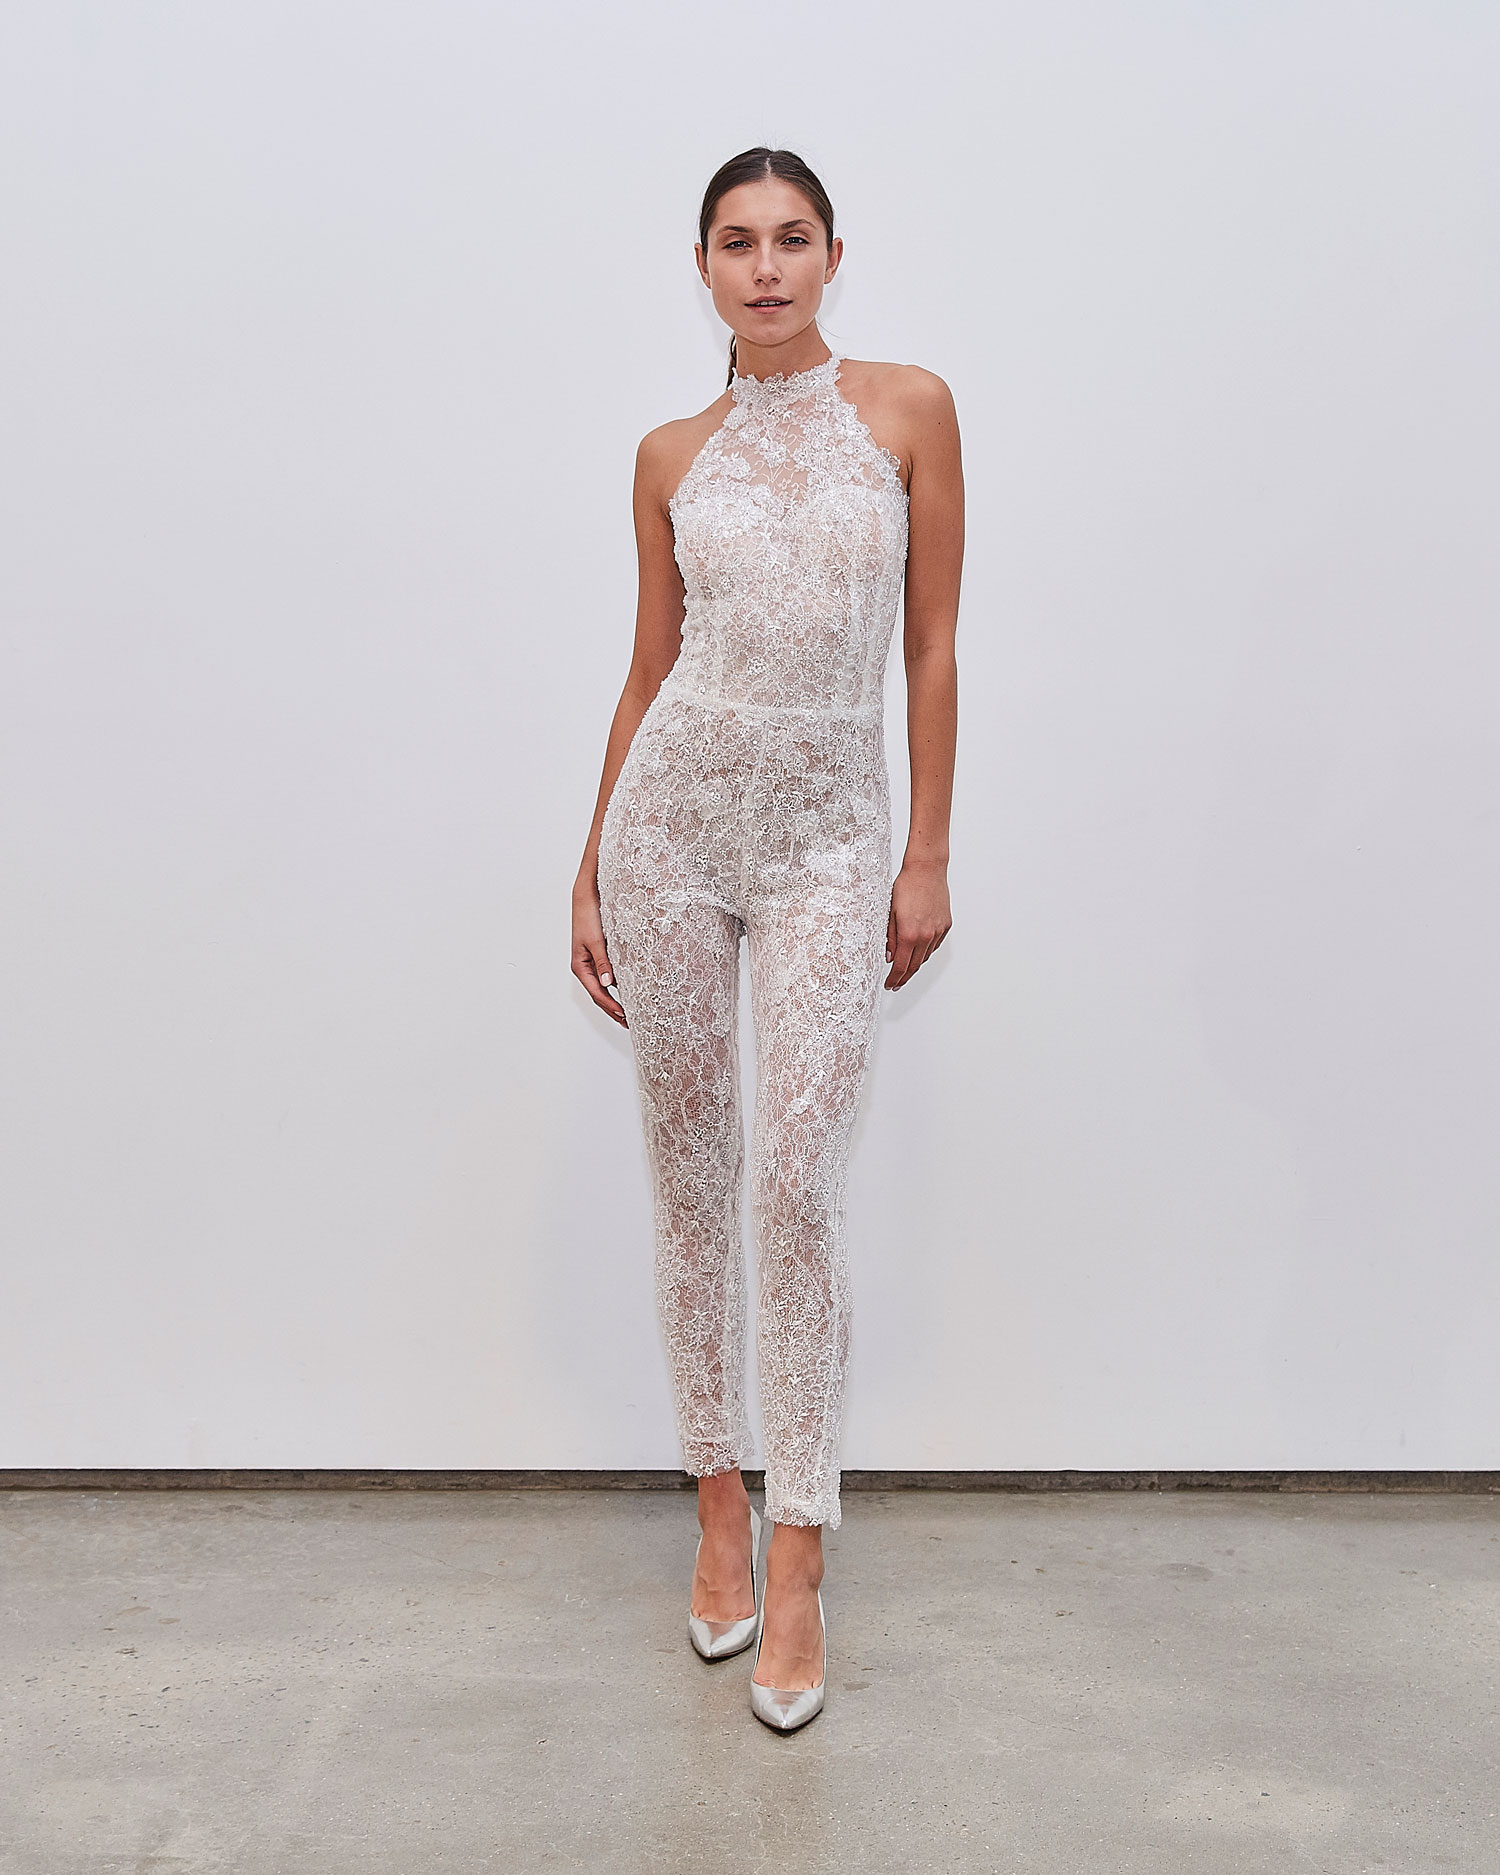 Francesca Miranda Fall 2020 bridal collection Jo wedding jumpsuit pant suit halter neckline